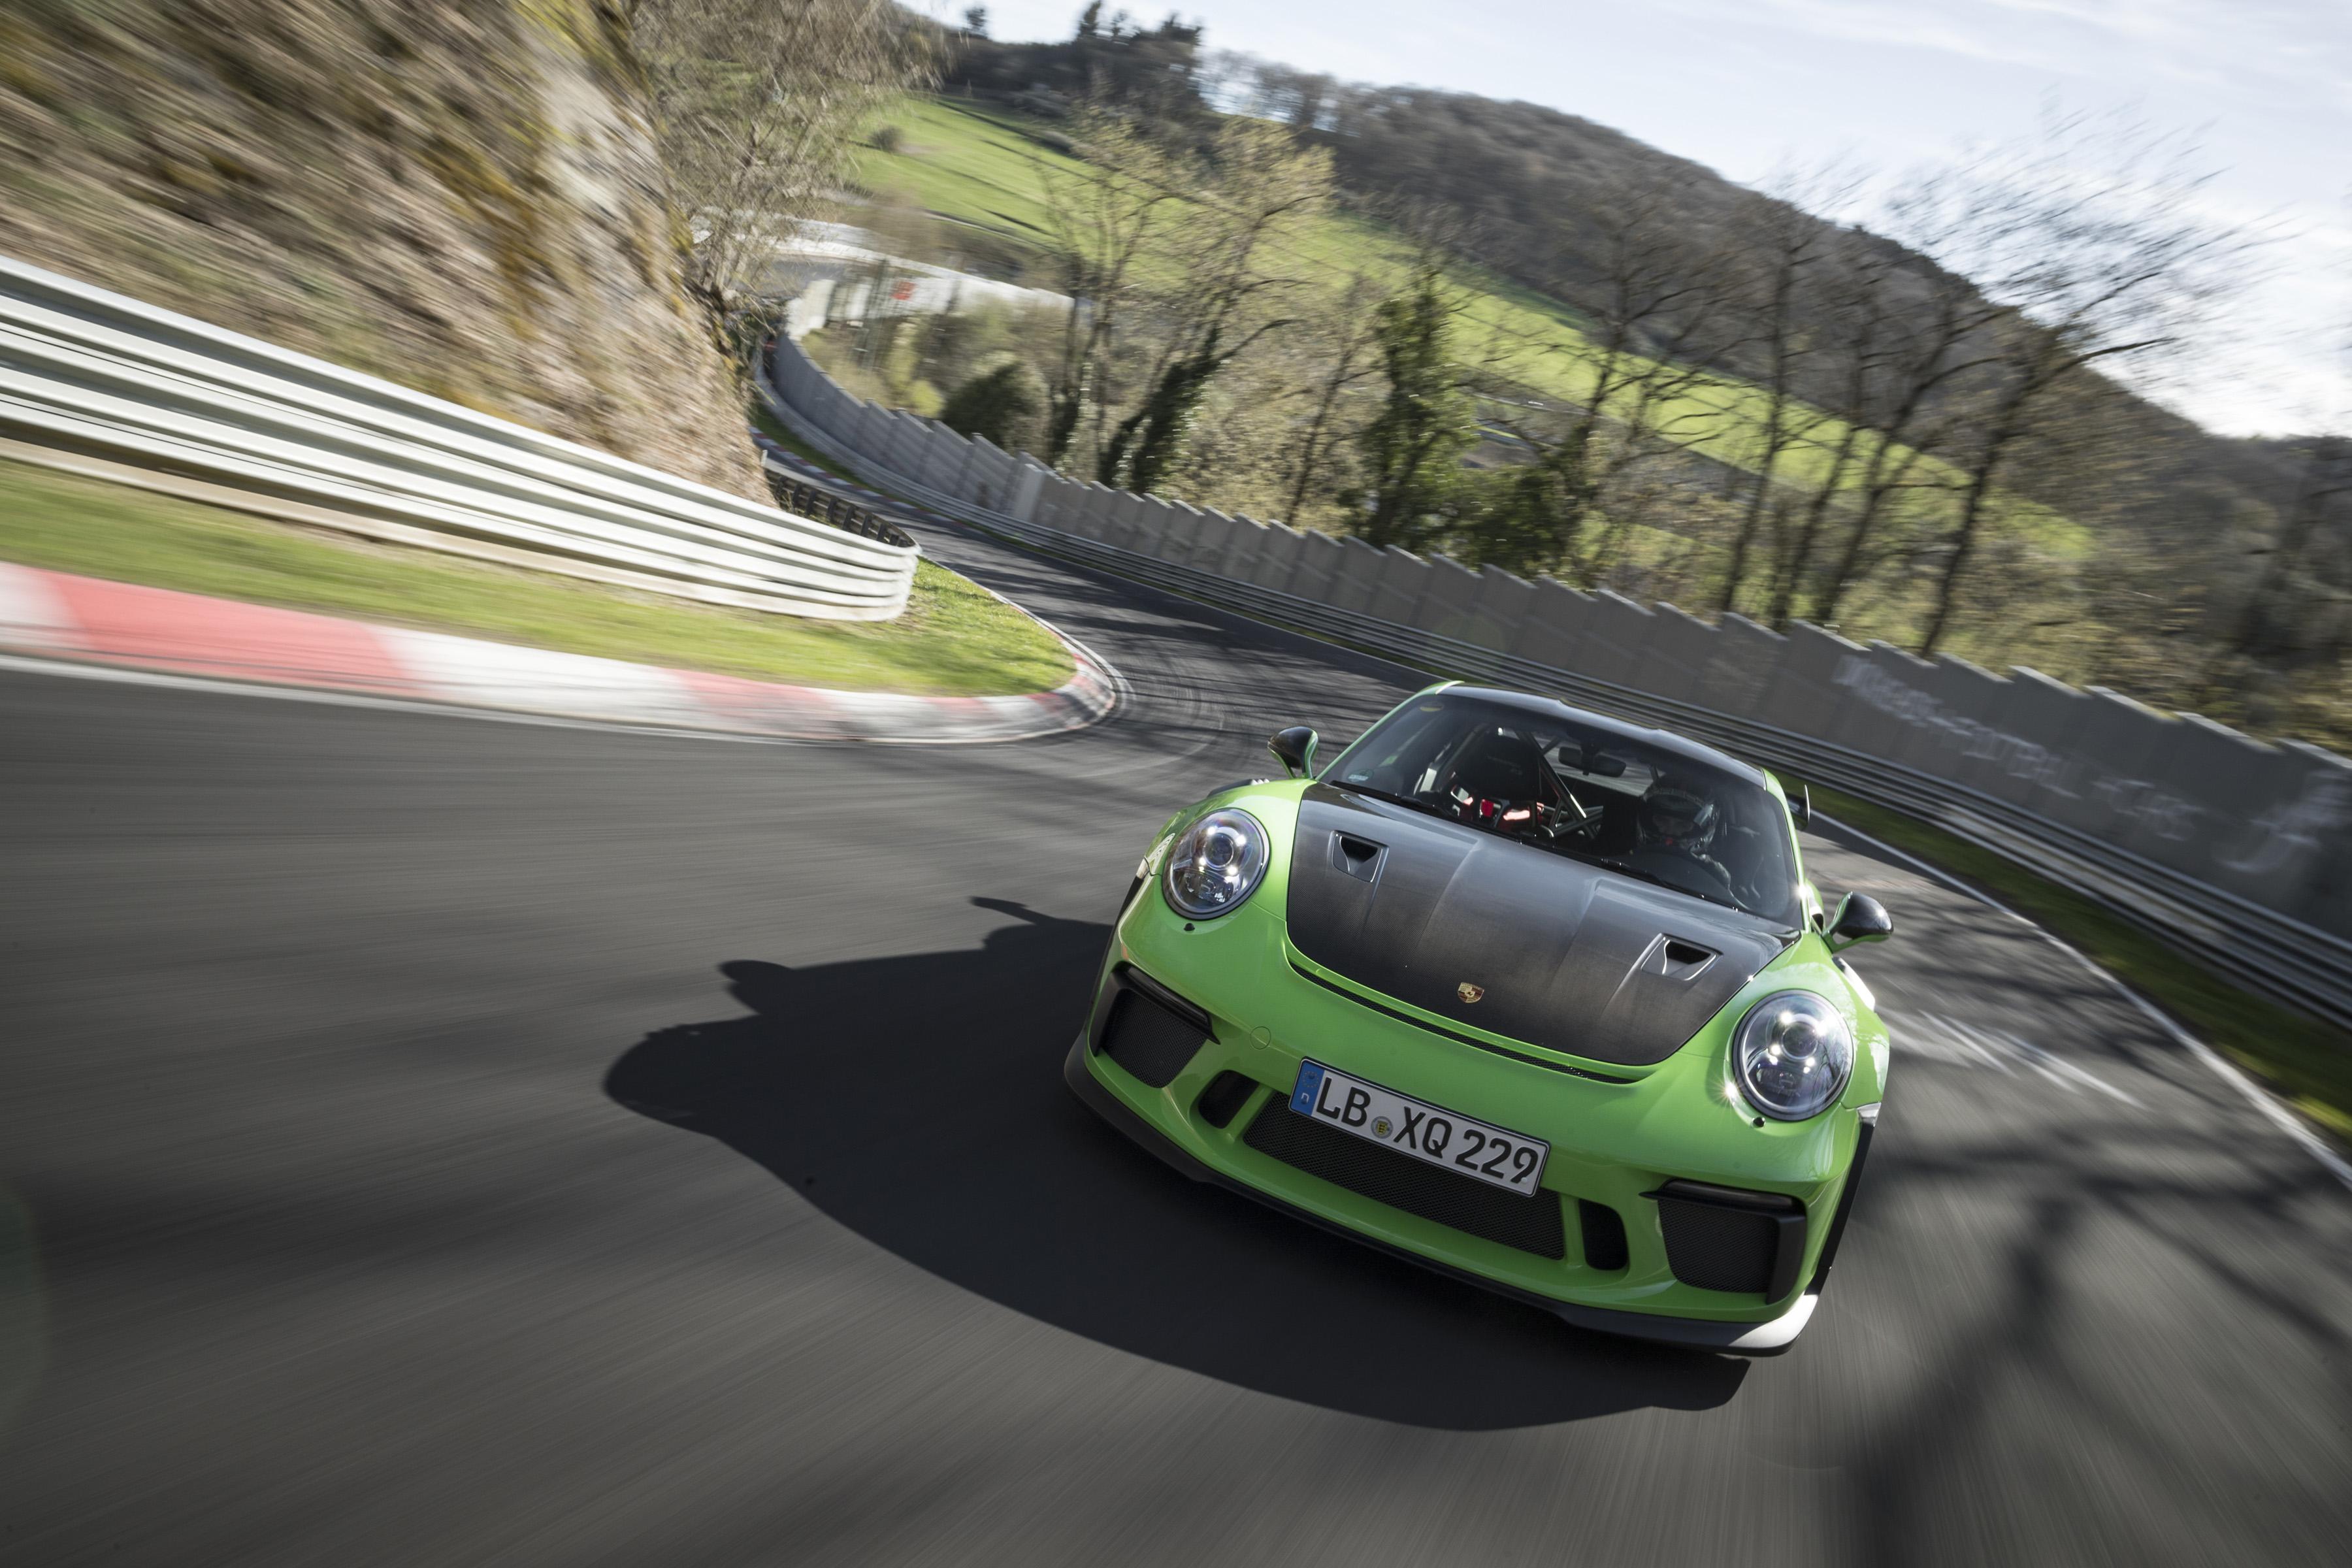 Porsche GT3 RS on Nürburgring (photo: Porsche)